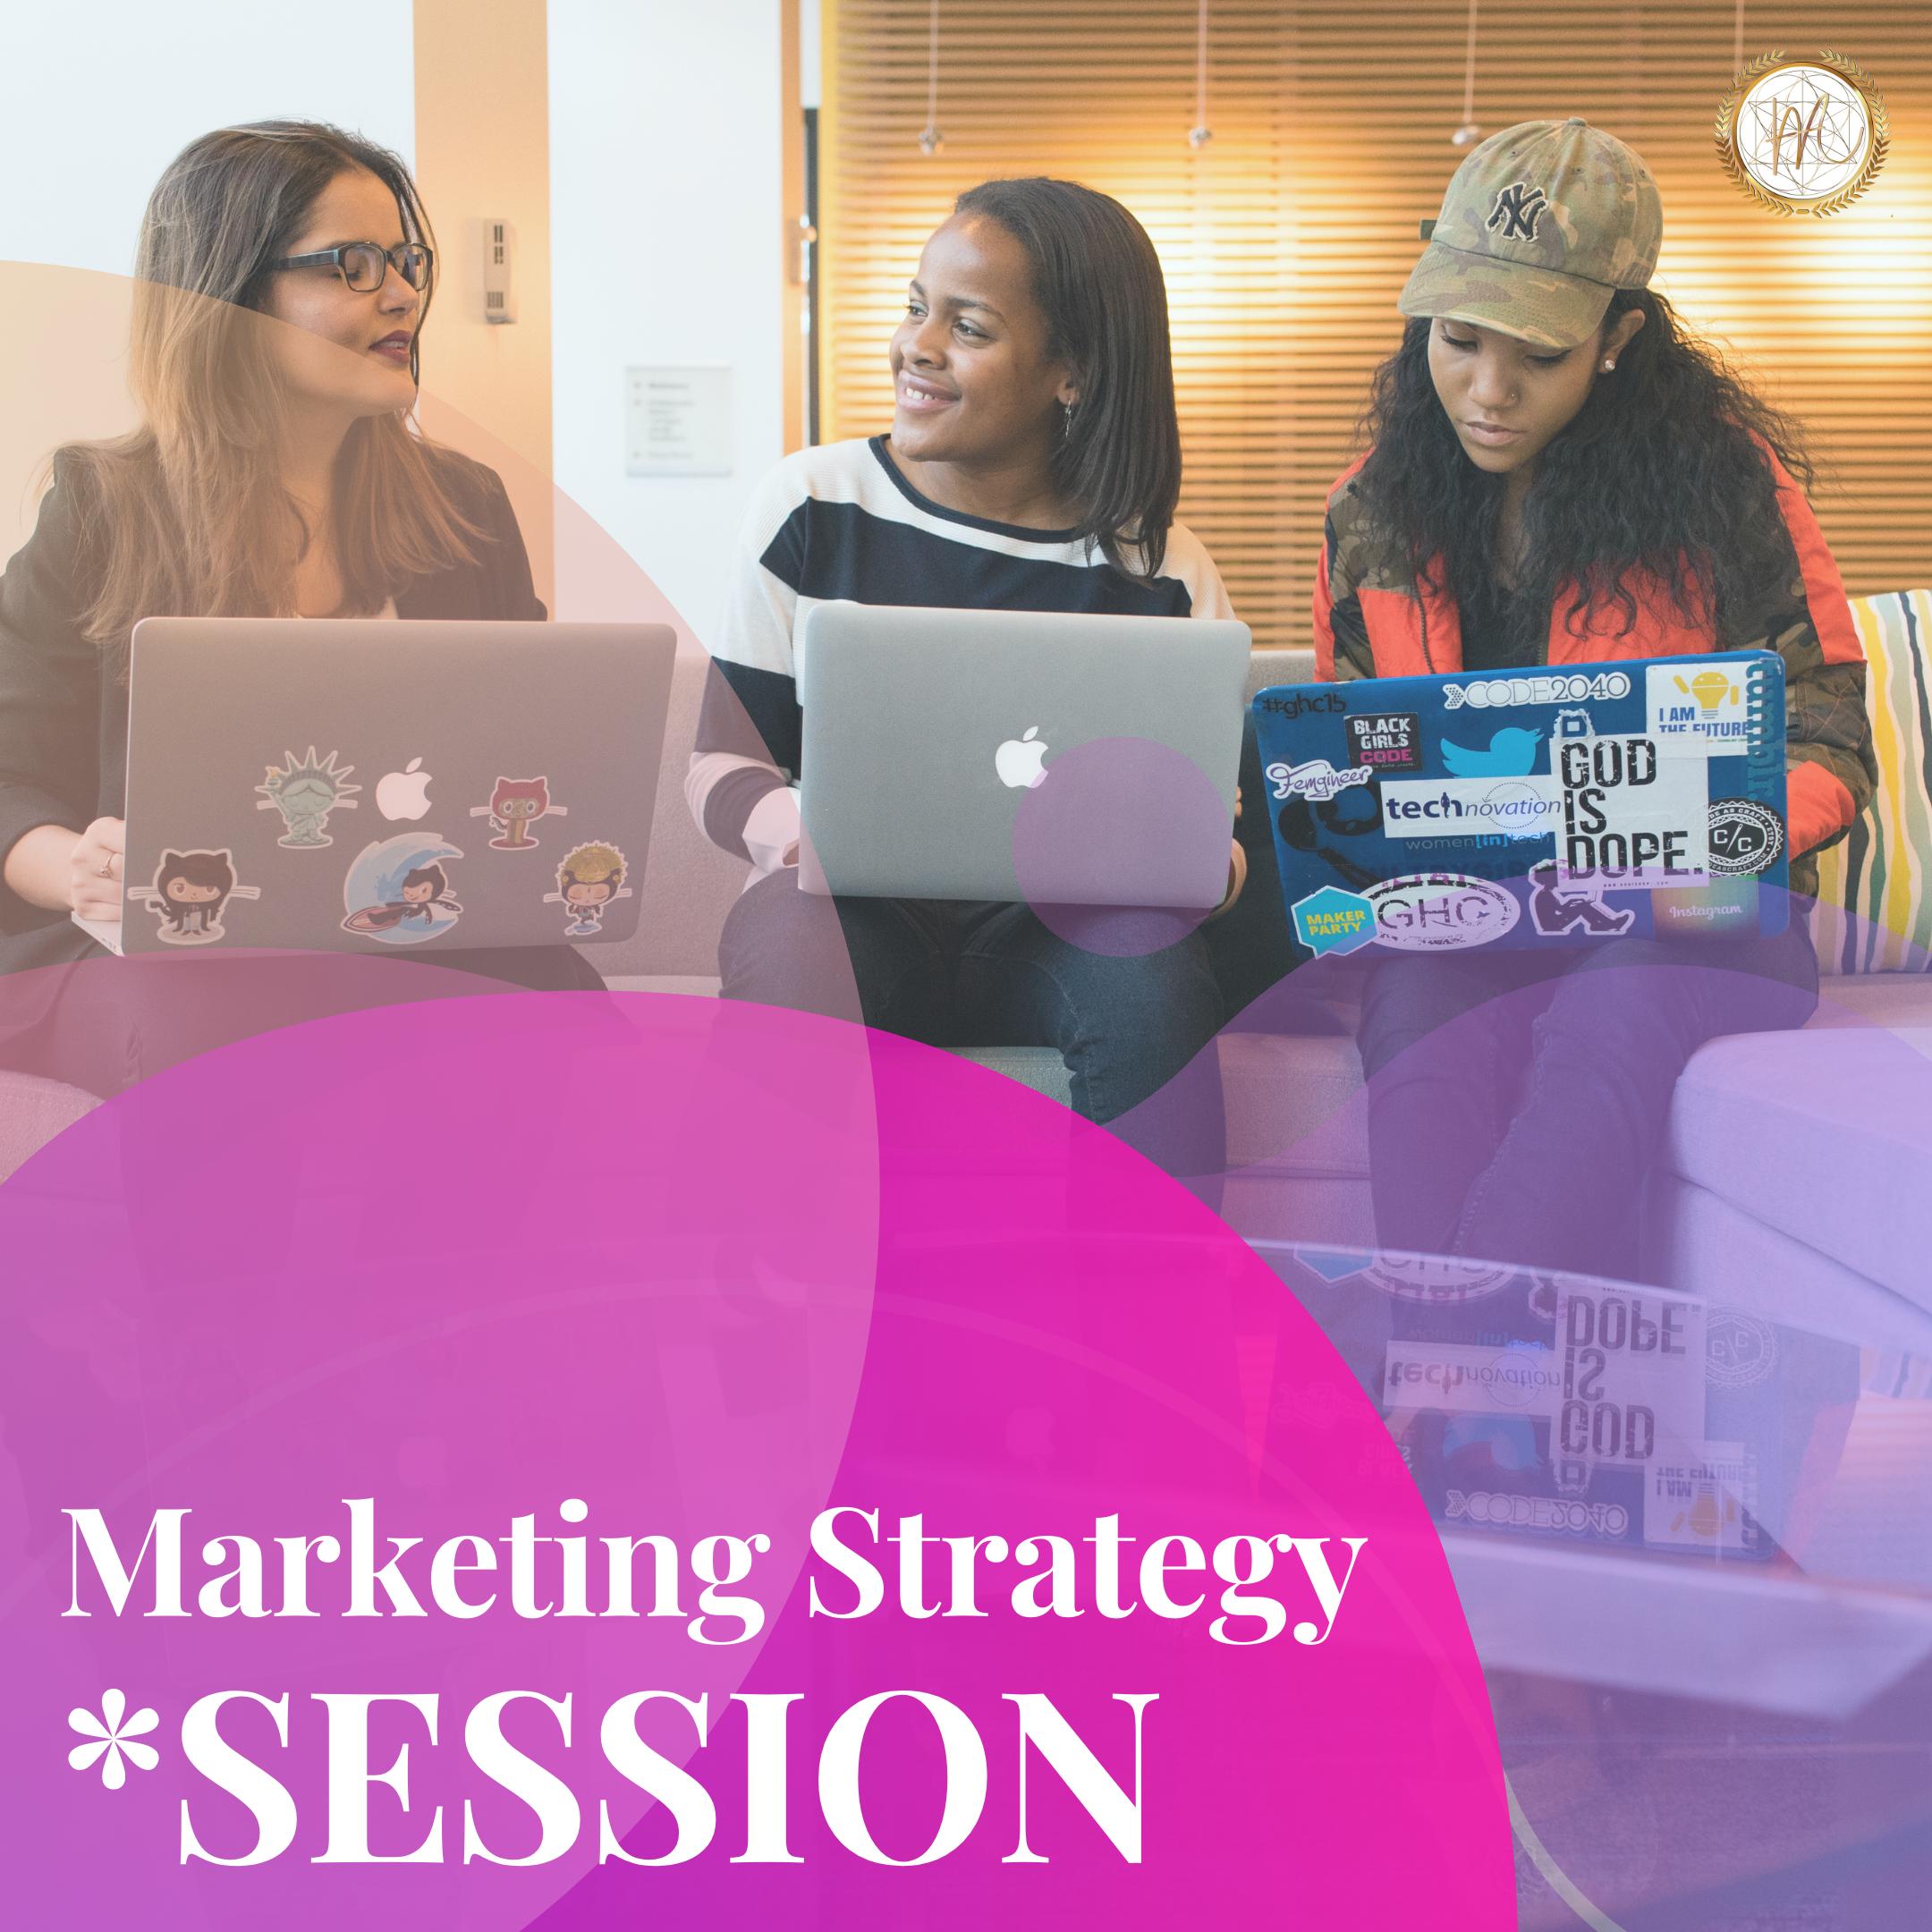 Marketing Strategy Package - iampowered media - POWERFUL MARKETING